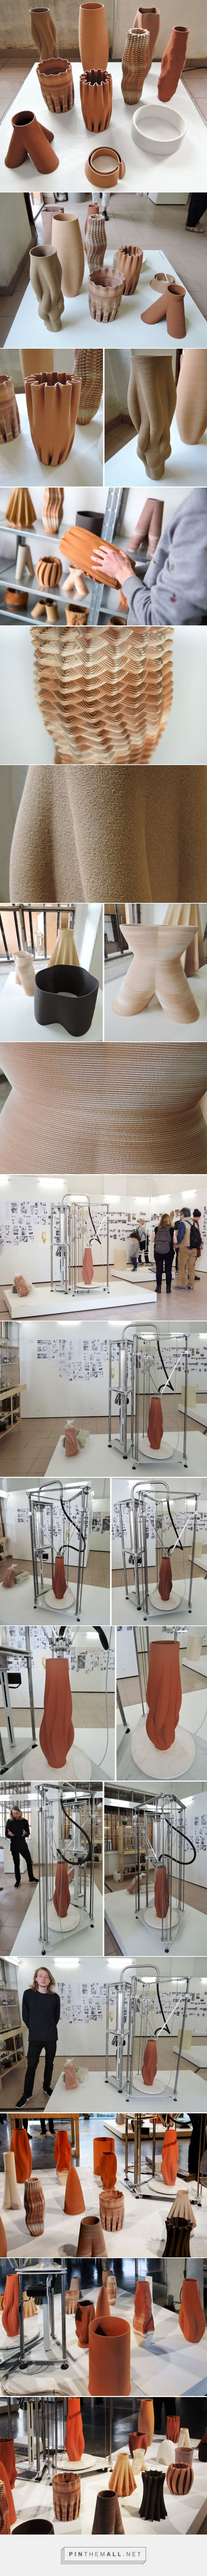 olivier van herpt's 3D printed ceramics at design academy eindhoven - created via http://pinthemall.net